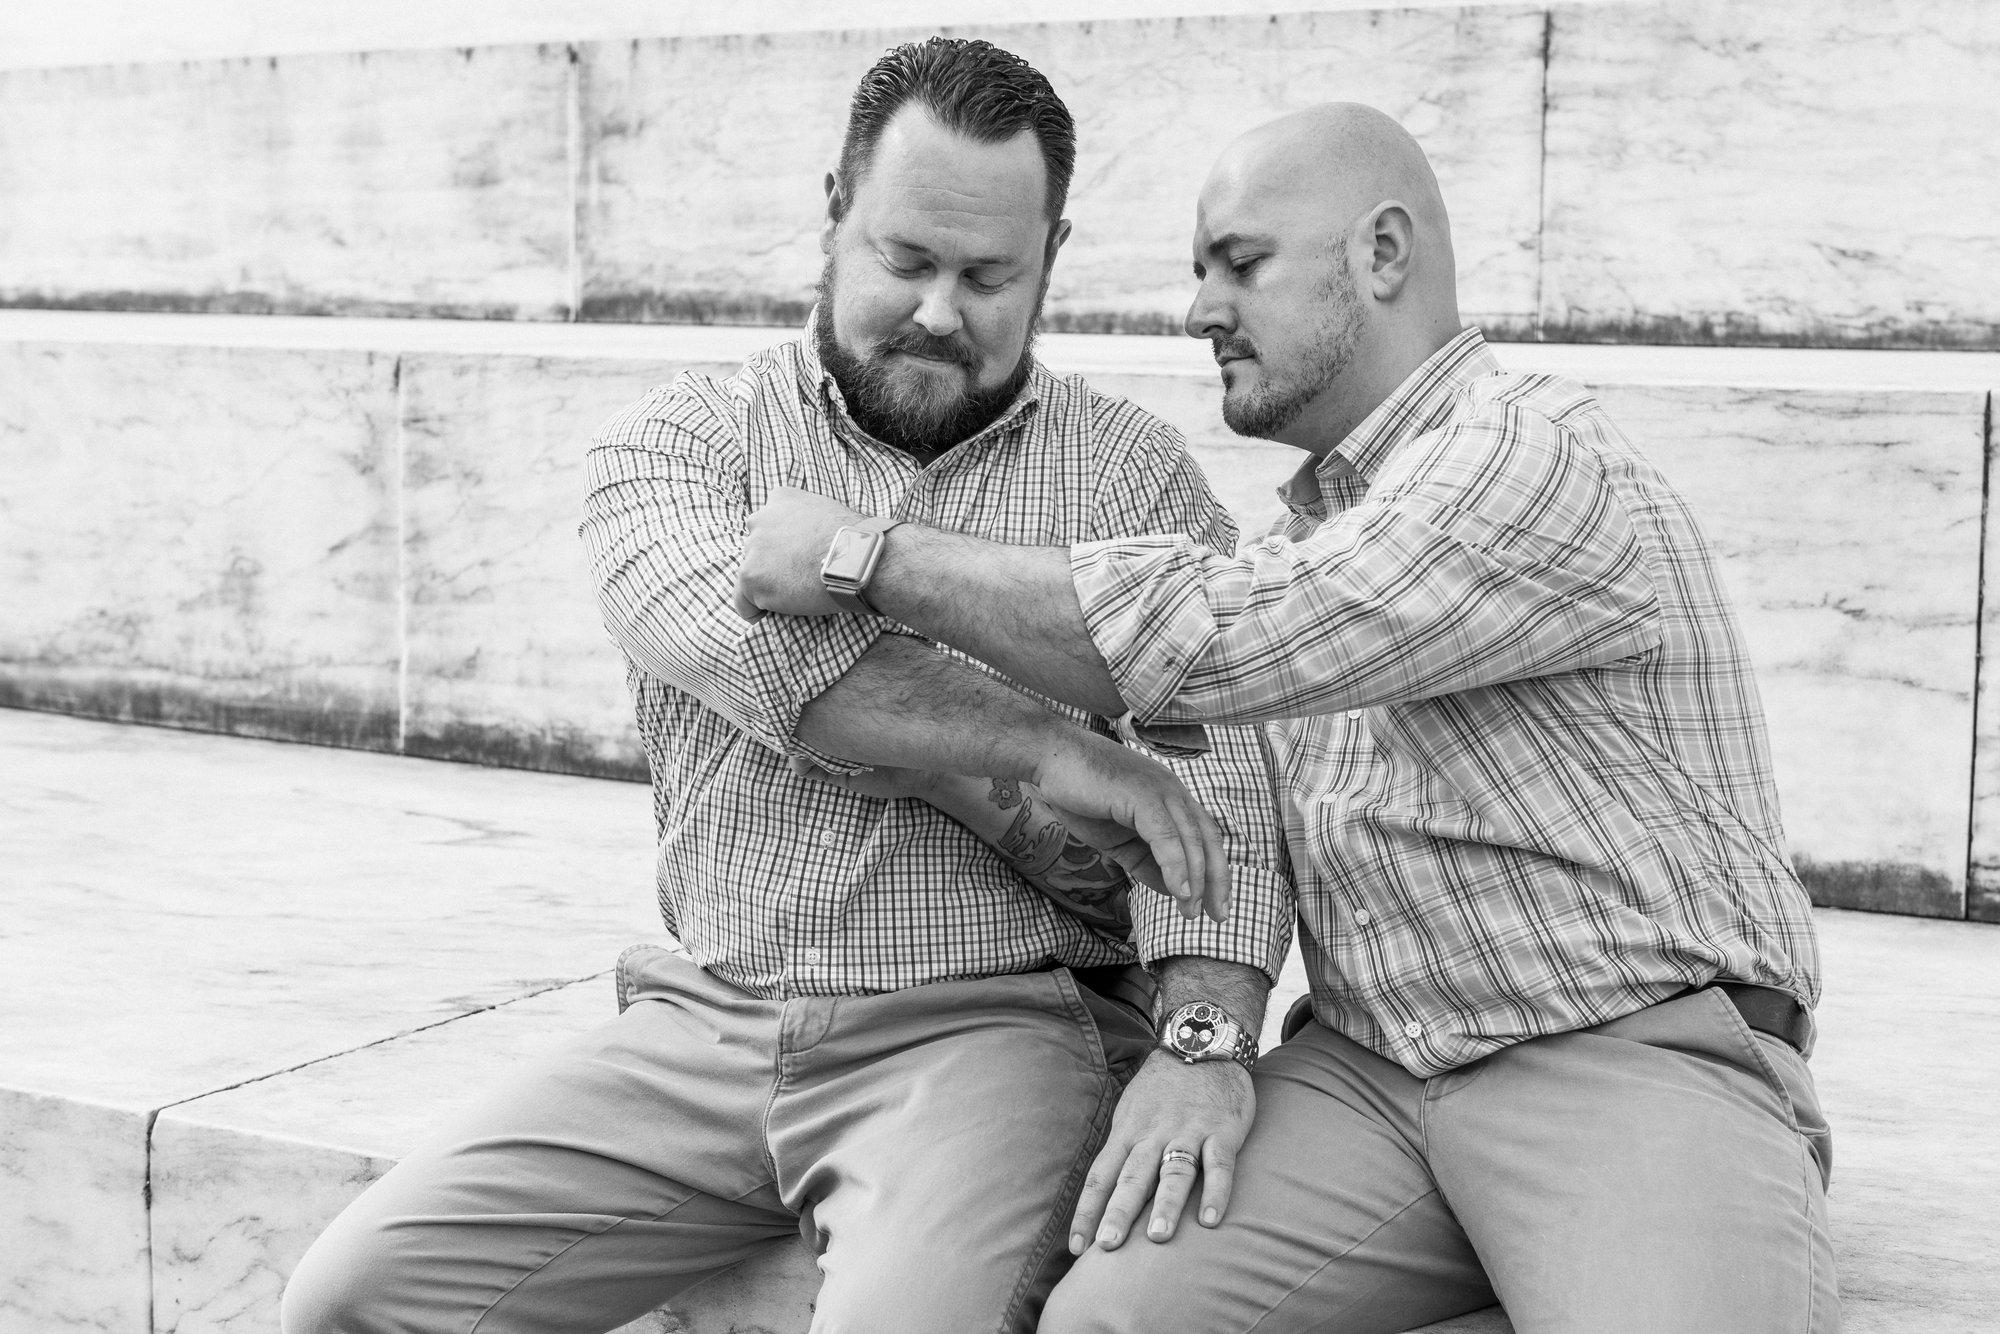 DC Same Sex Engagement Shoot at the Jefferson Memorial in Washington, DC - Two guys adjusting shirts.